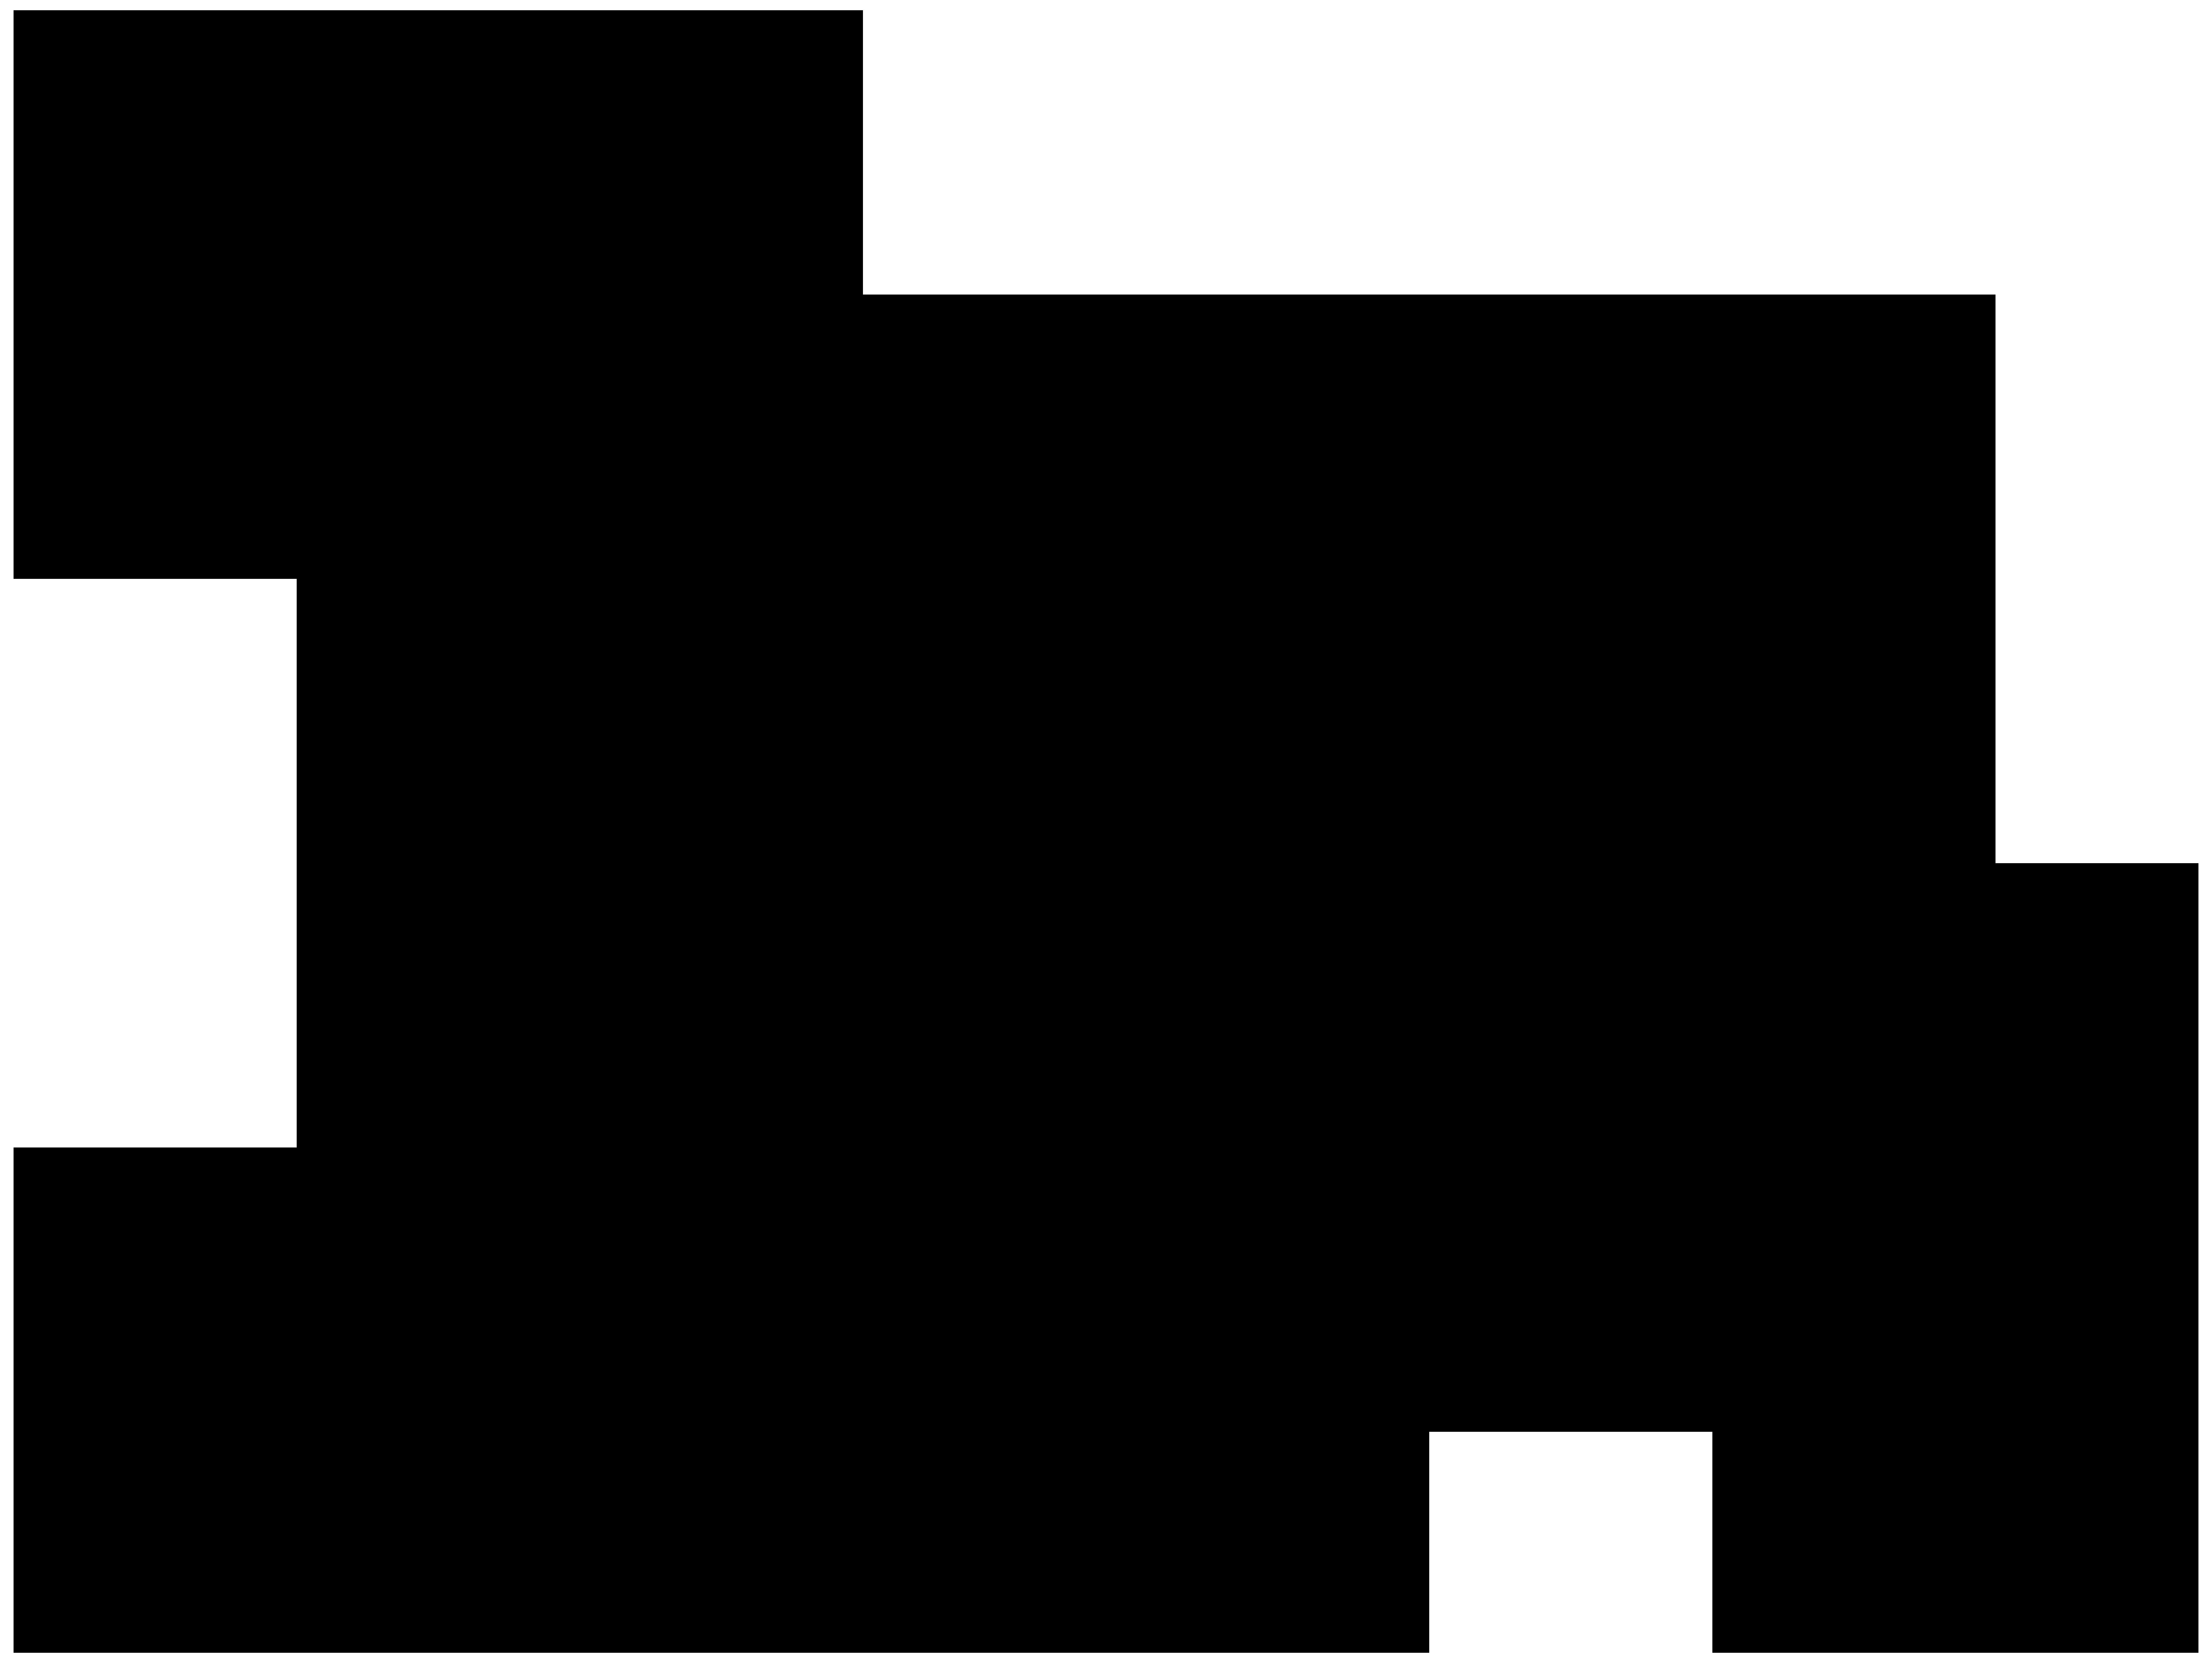 Clipart tv border. Horse silhouette png transparent